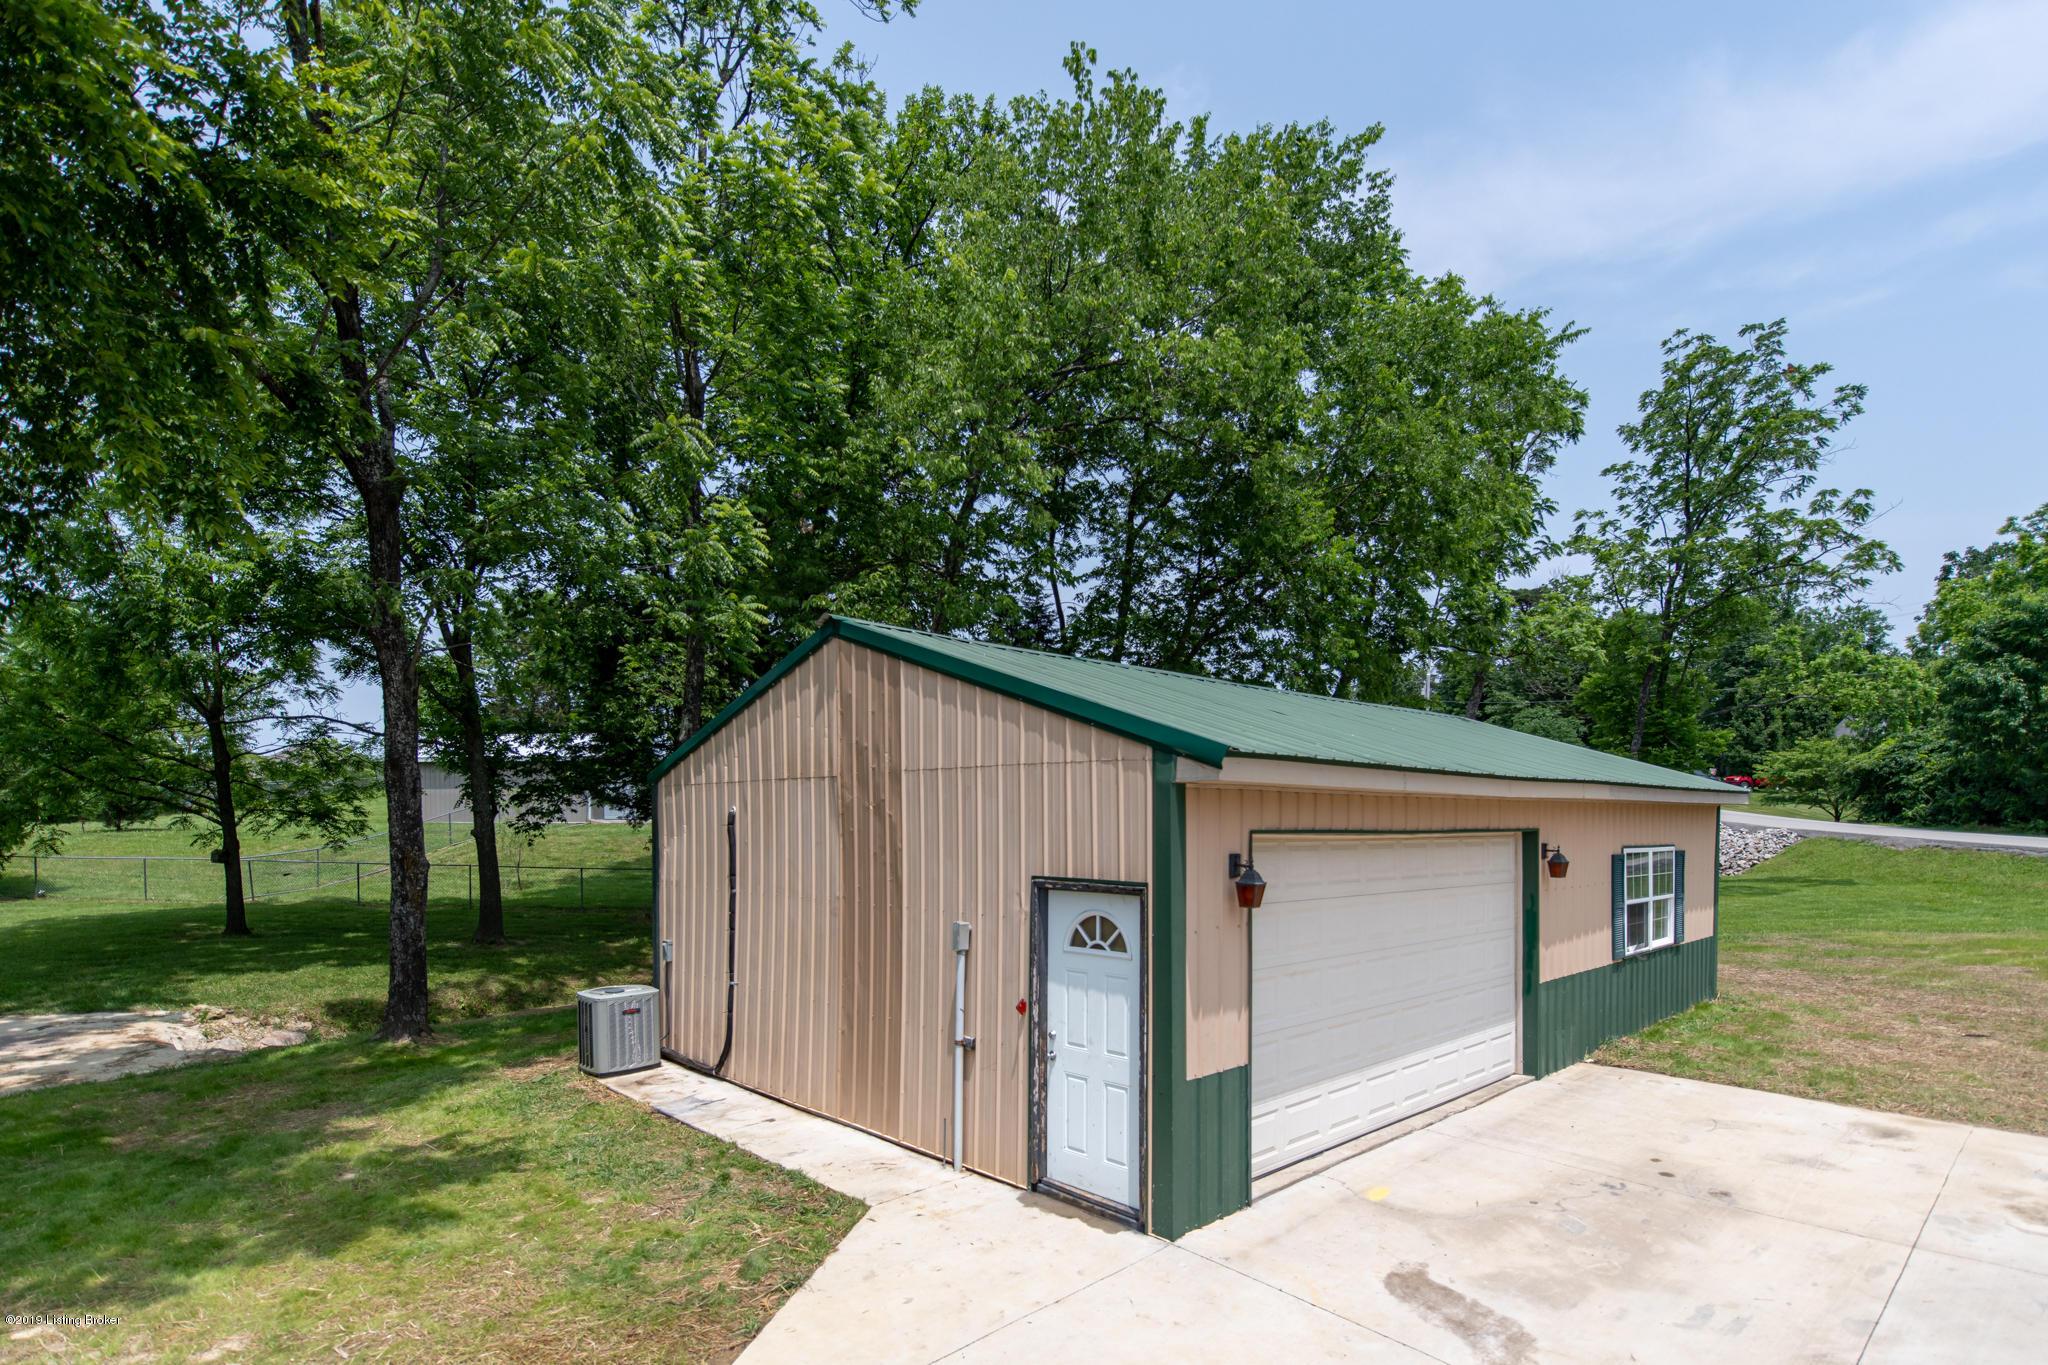 411 Tanglewood Rd, Shepherdsville, Kentucky 40165, 3 Bedrooms Bedrooms, 5 Rooms Rooms,2 BathroomsBathrooms,Residential,For Sale,Tanglewood,1534049